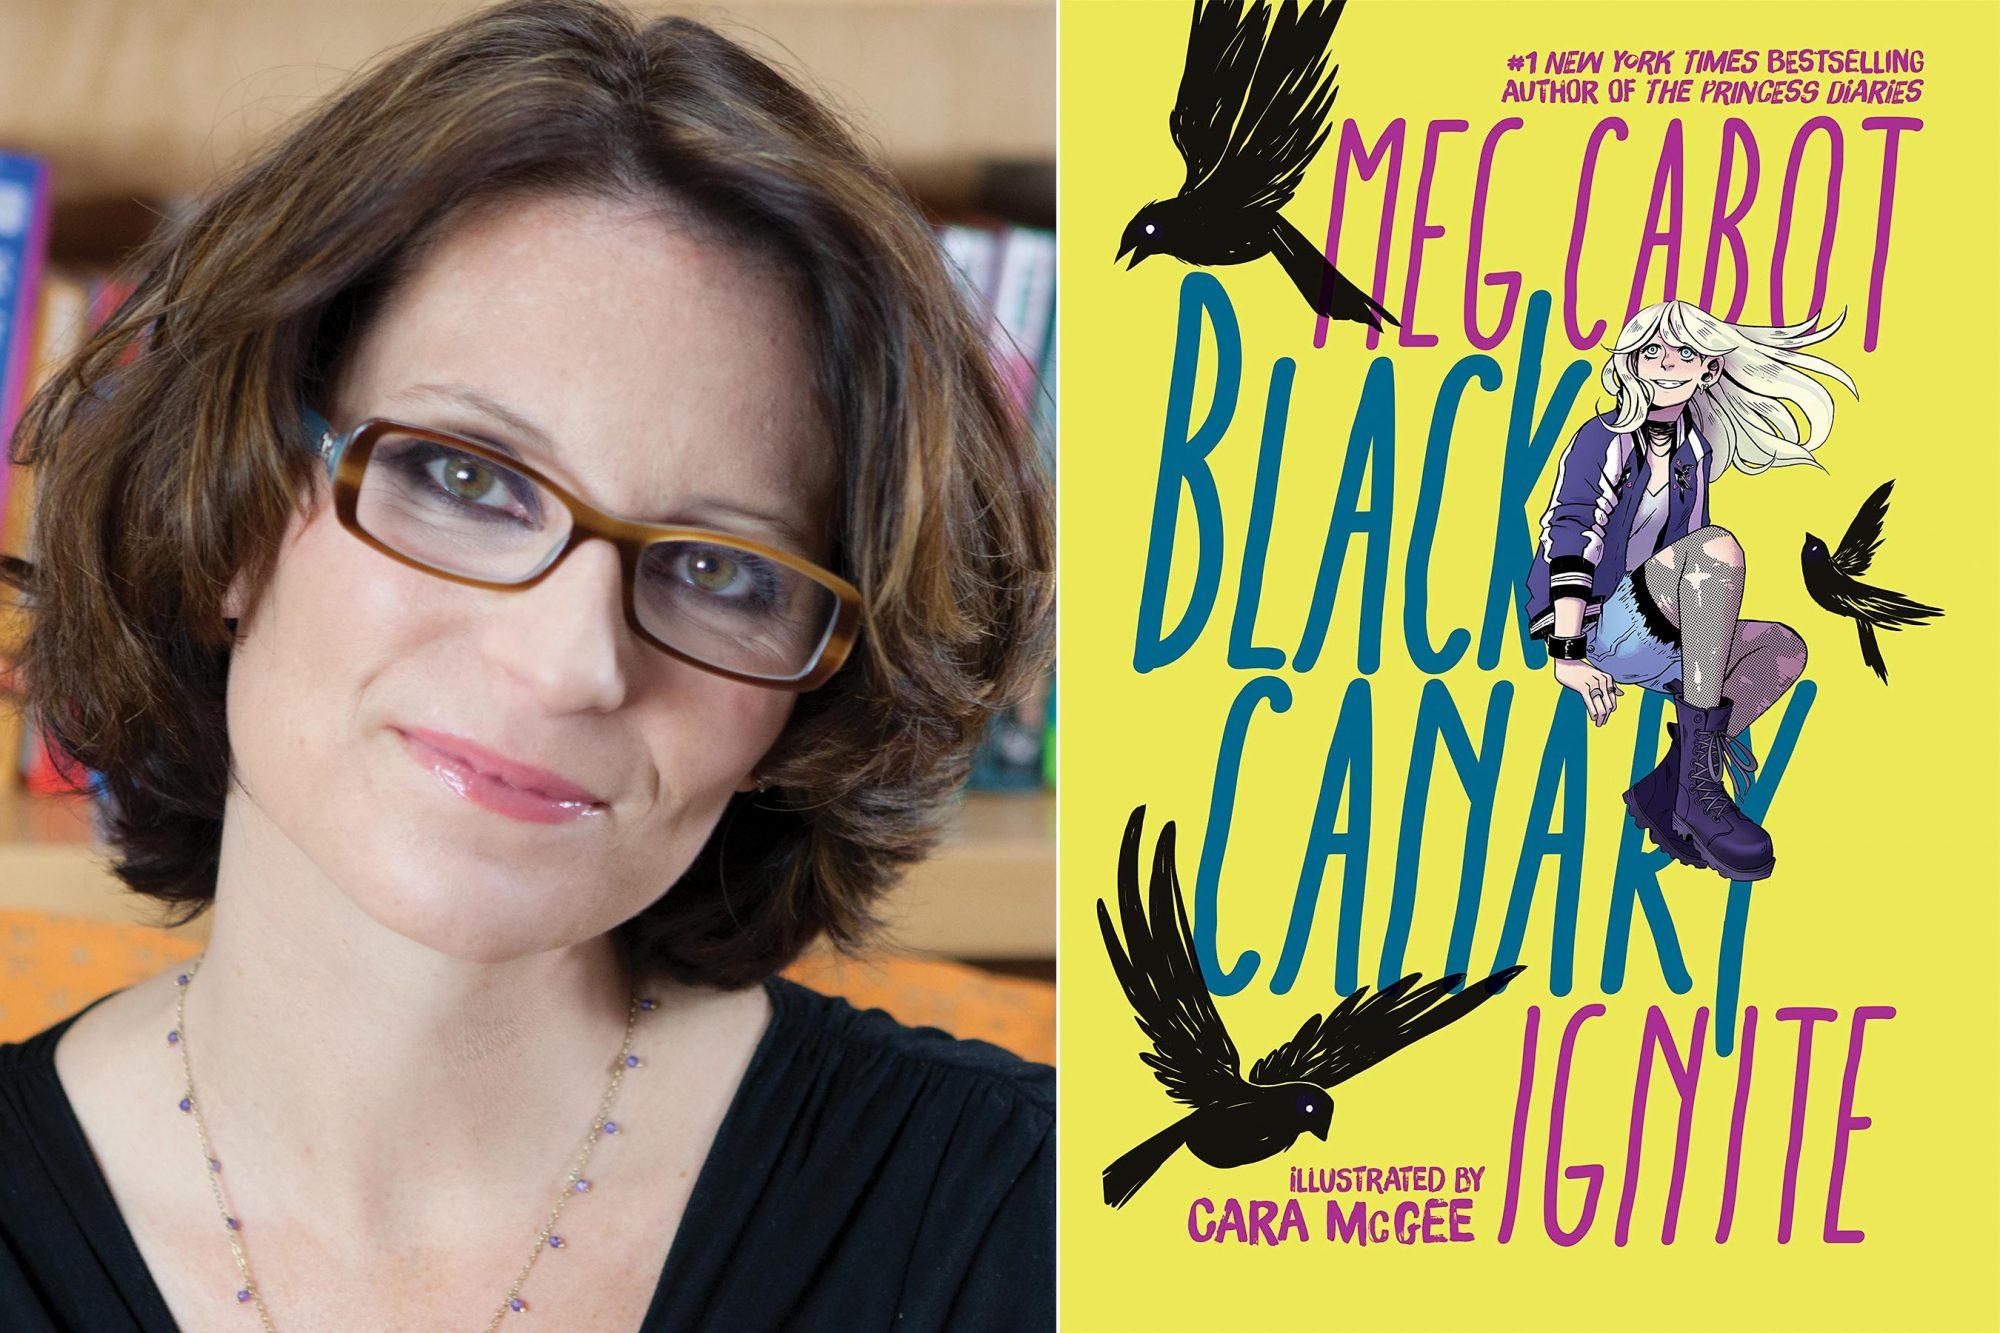 Meg Cabot author photo CR: Lisa DeTullio Russell Black Canary: Ignite – October 29, 2019 by Meg Cabot (Author), Cara McGee (Illustrator) CR: DC Zoom